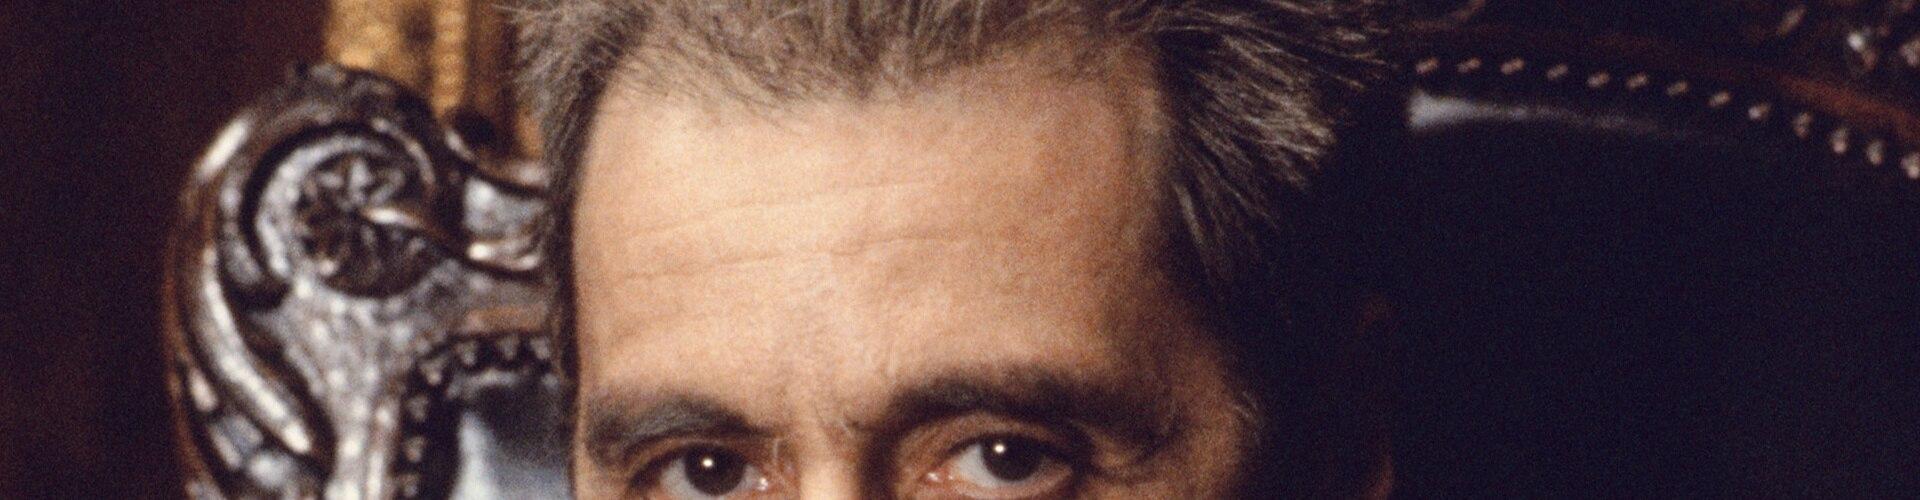 Watch The Godfather Part III Online